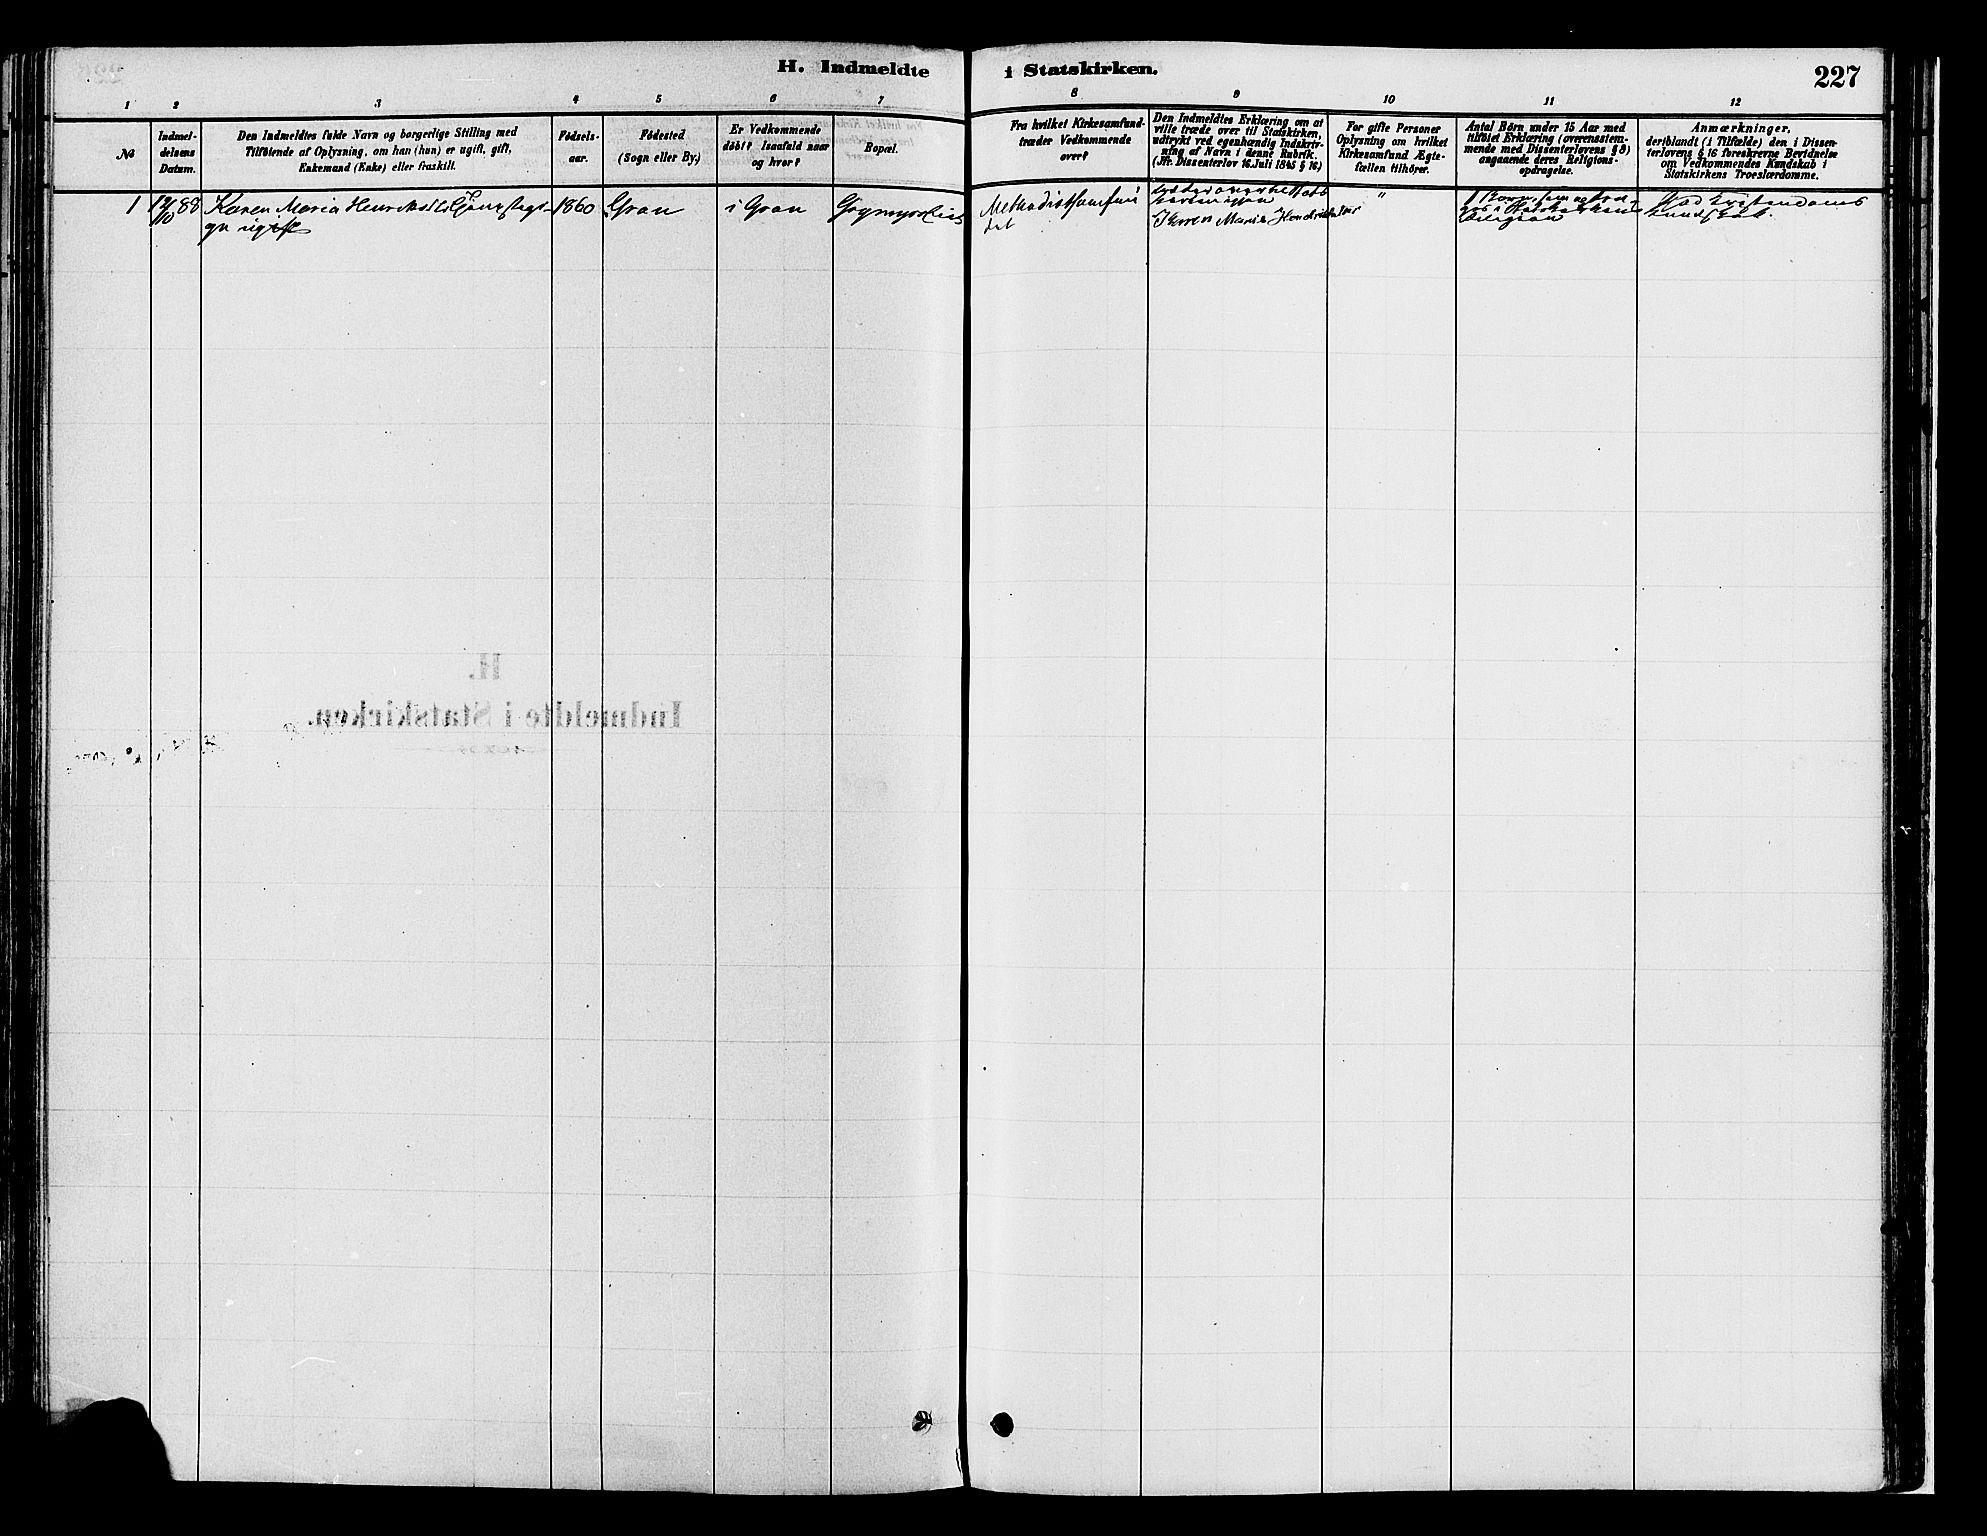 SAH, Gran prestekontor, Ministerialbok nr. 14, 1880-1889, s. 227